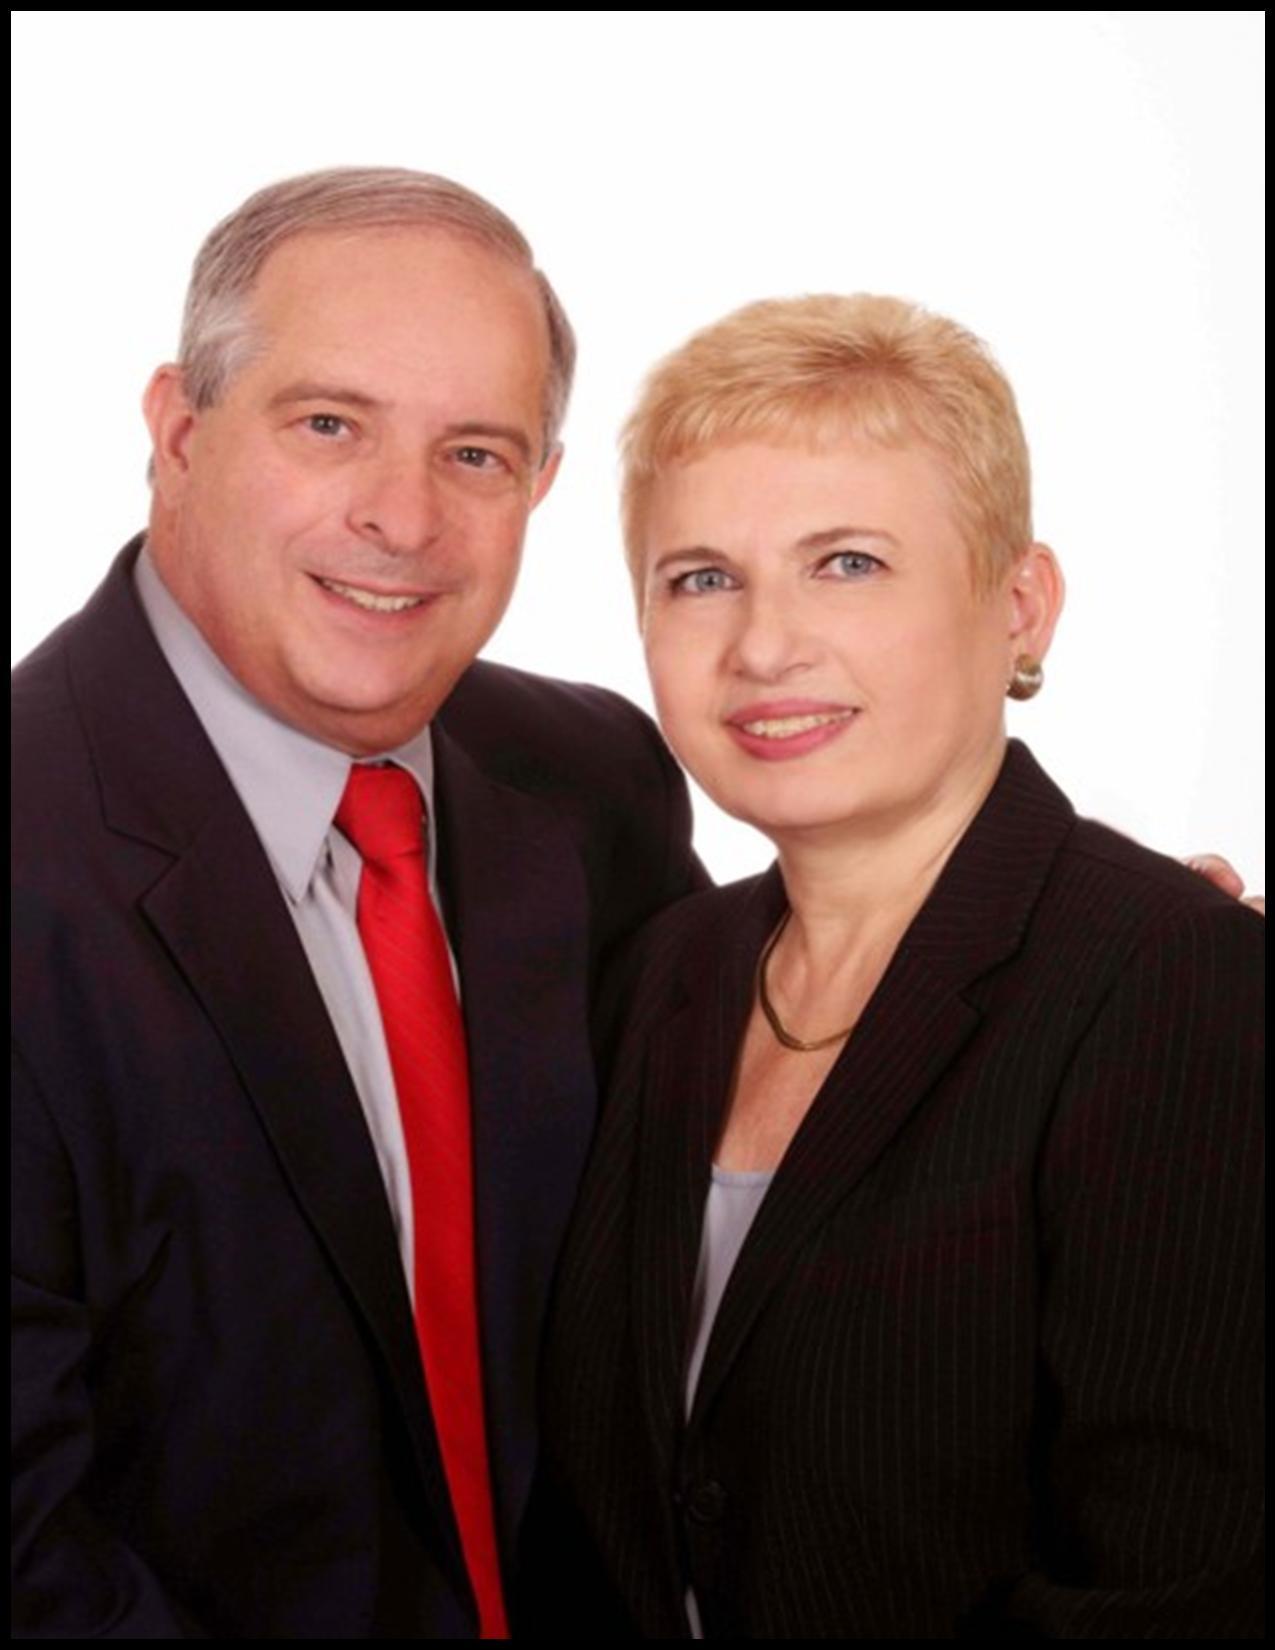 Neil and Ronnie Schwartz Profile Photo